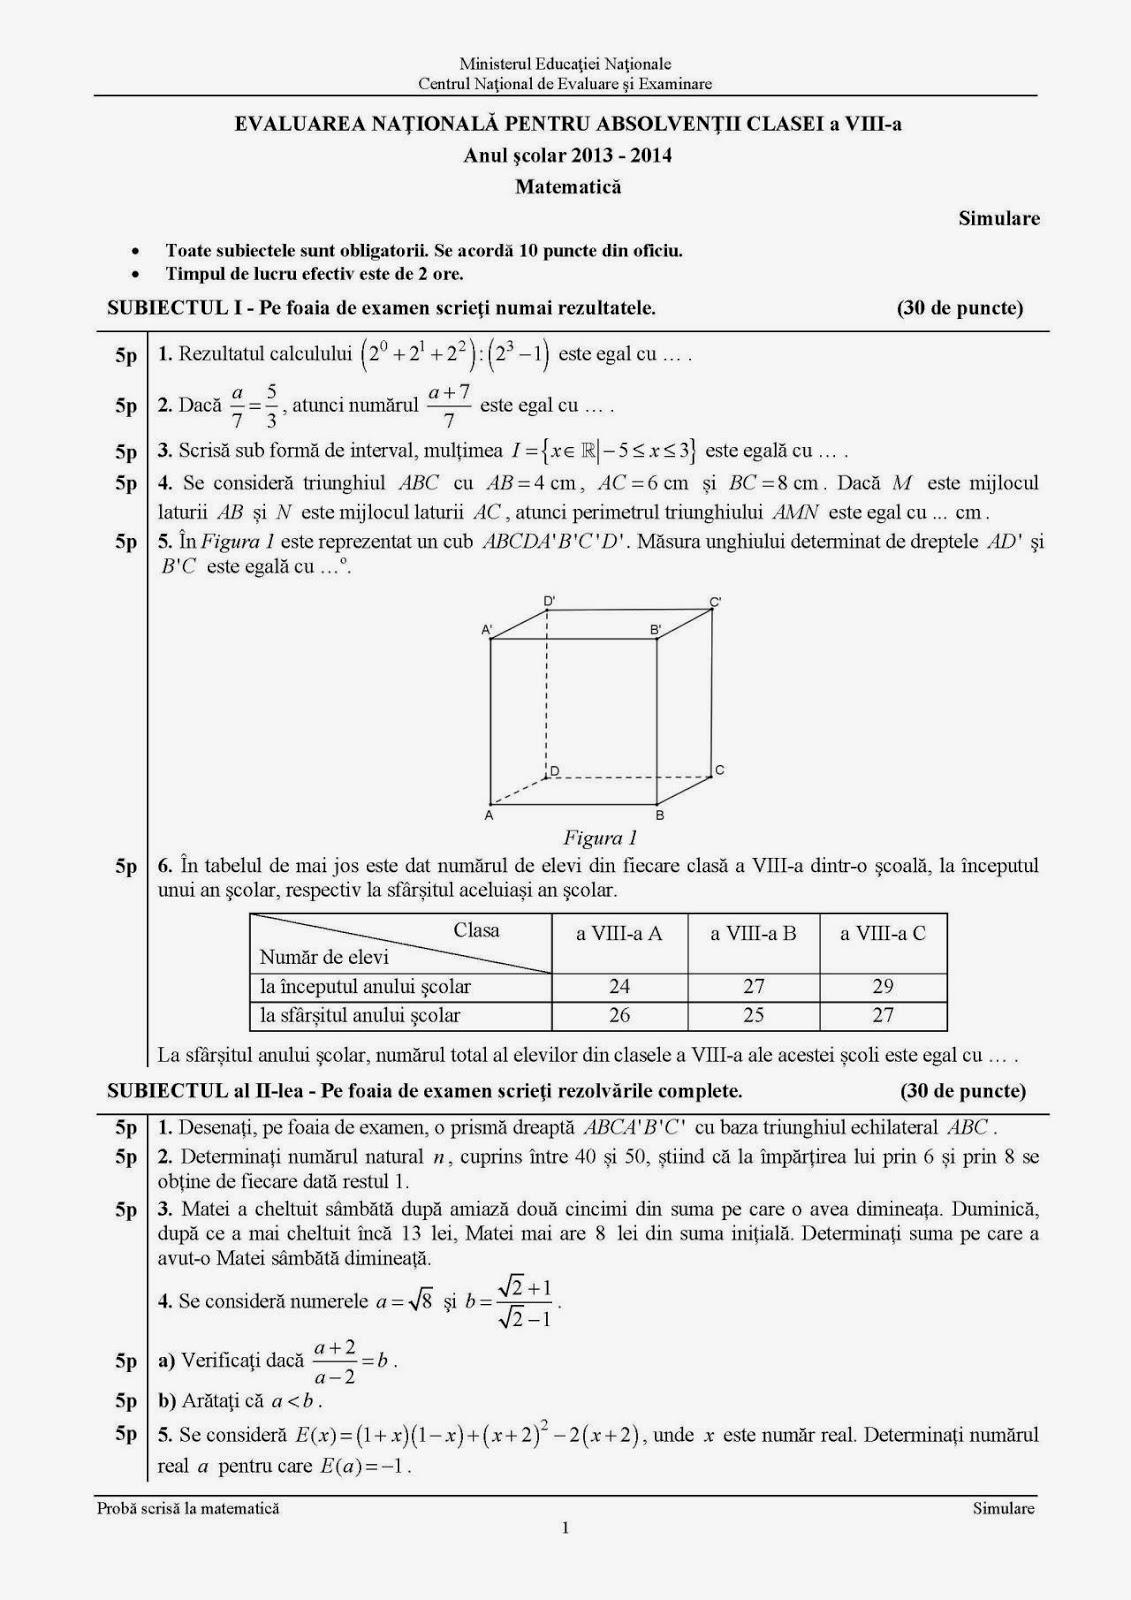 Subiecte, variante si rezolvari pentru examene nationale ...